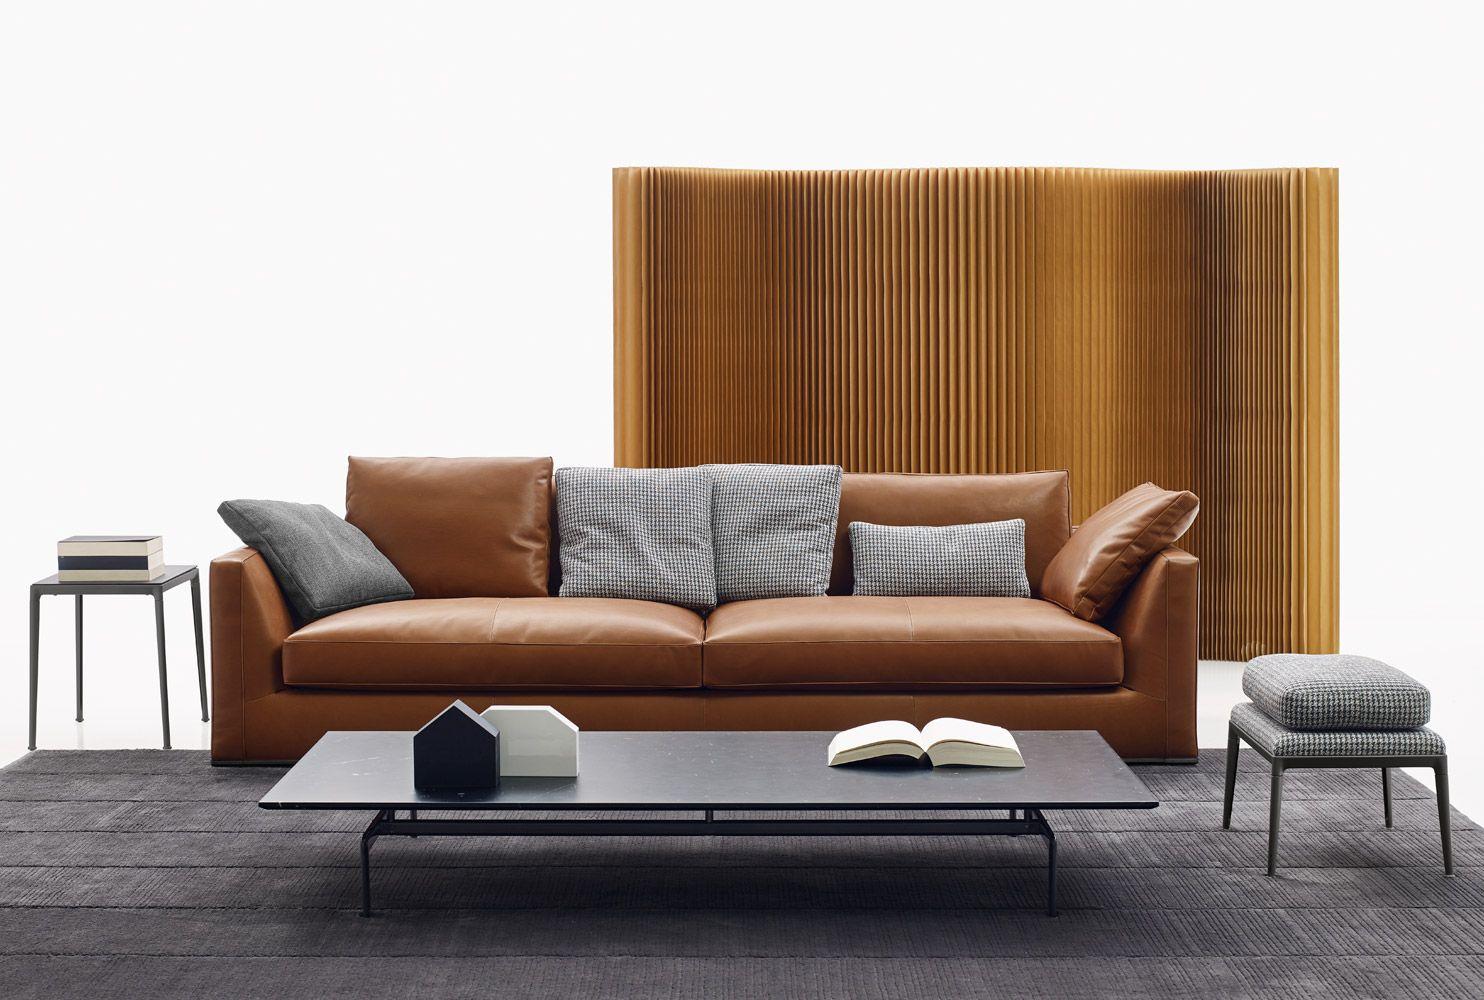 Sofa: RICHARD - Collection: B&B ITALIA - Design: Antonio Citterio ...